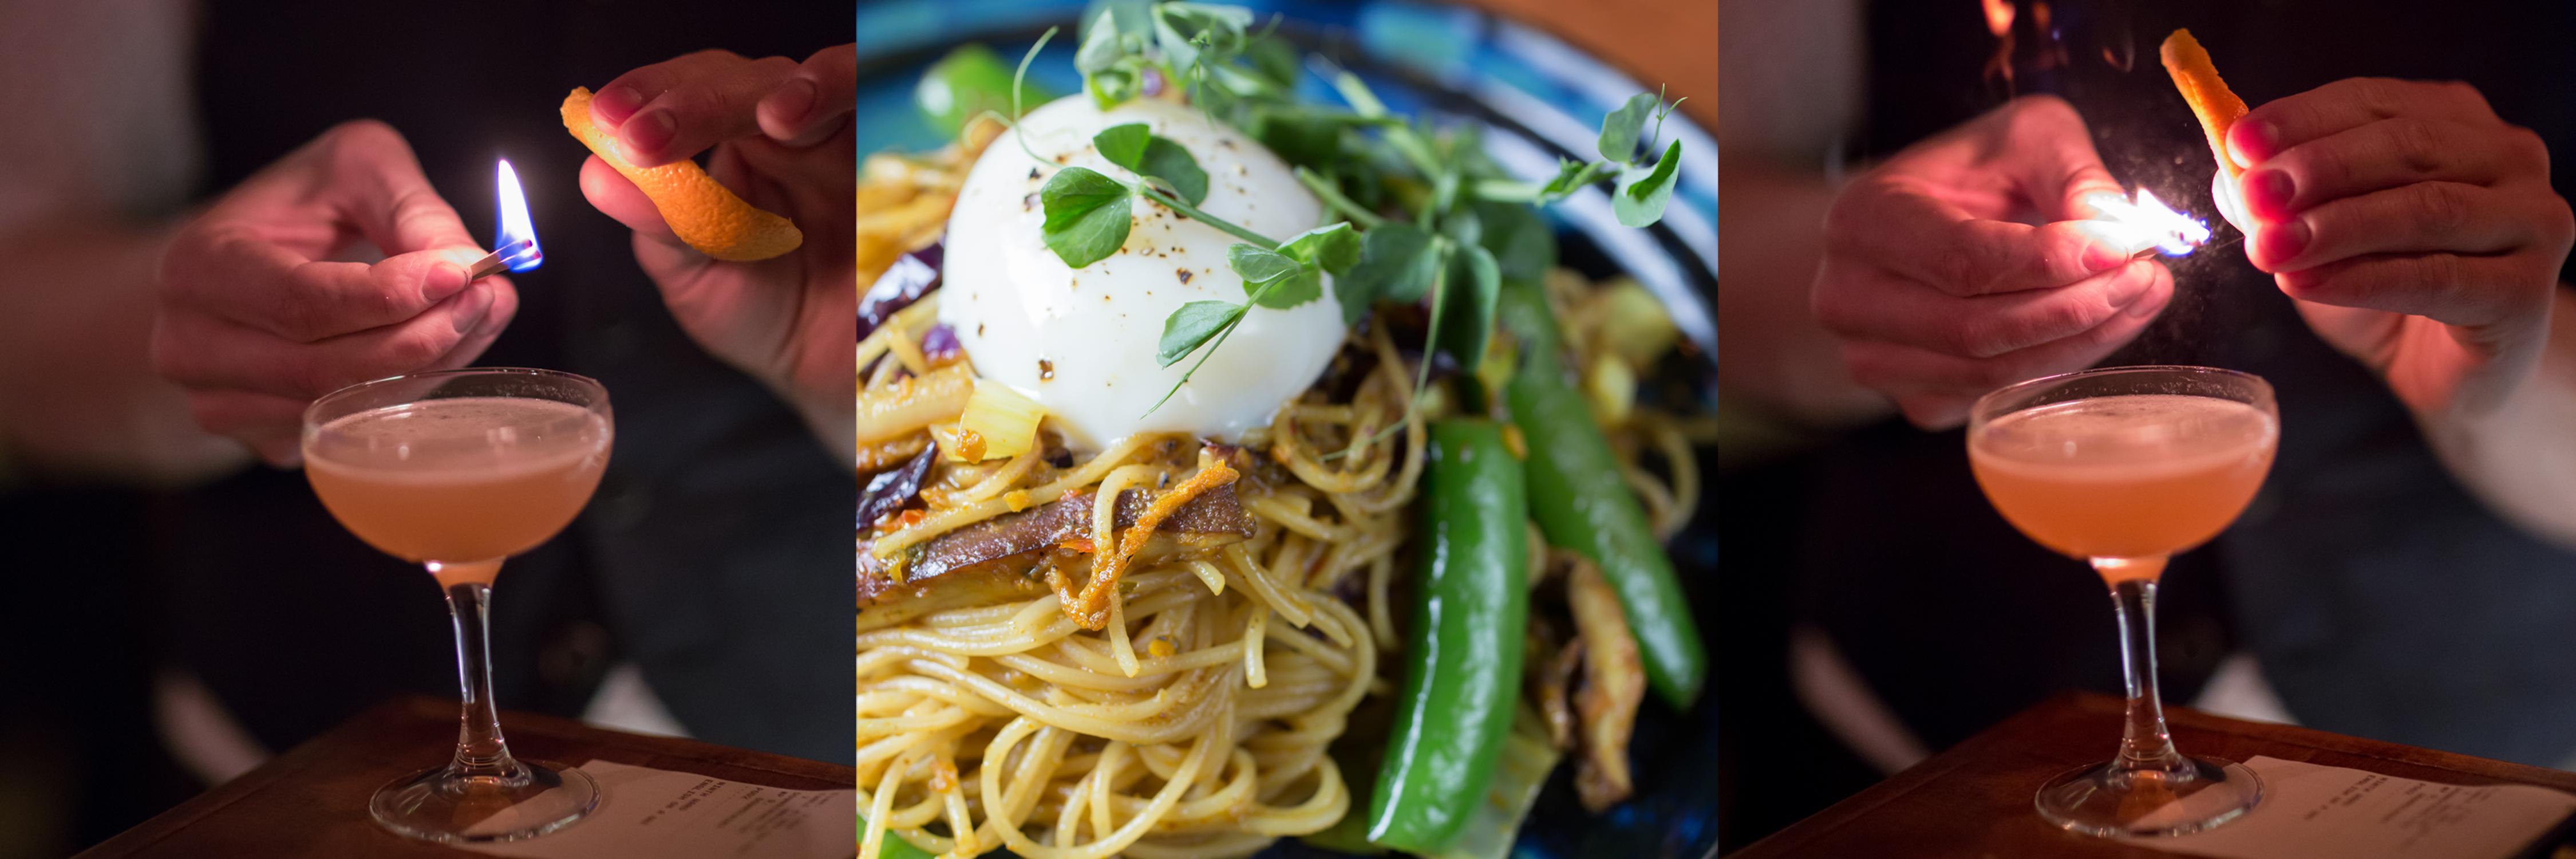 Tock - Discover unique culinary experiences